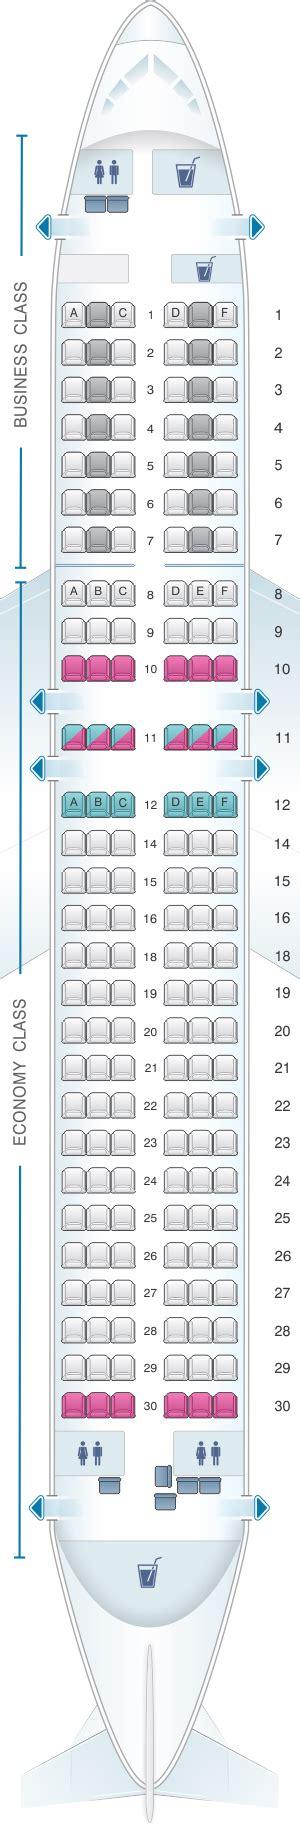 airbus a320 sieges plan de cabine lufthansa airbus a320 seatmaestro fr